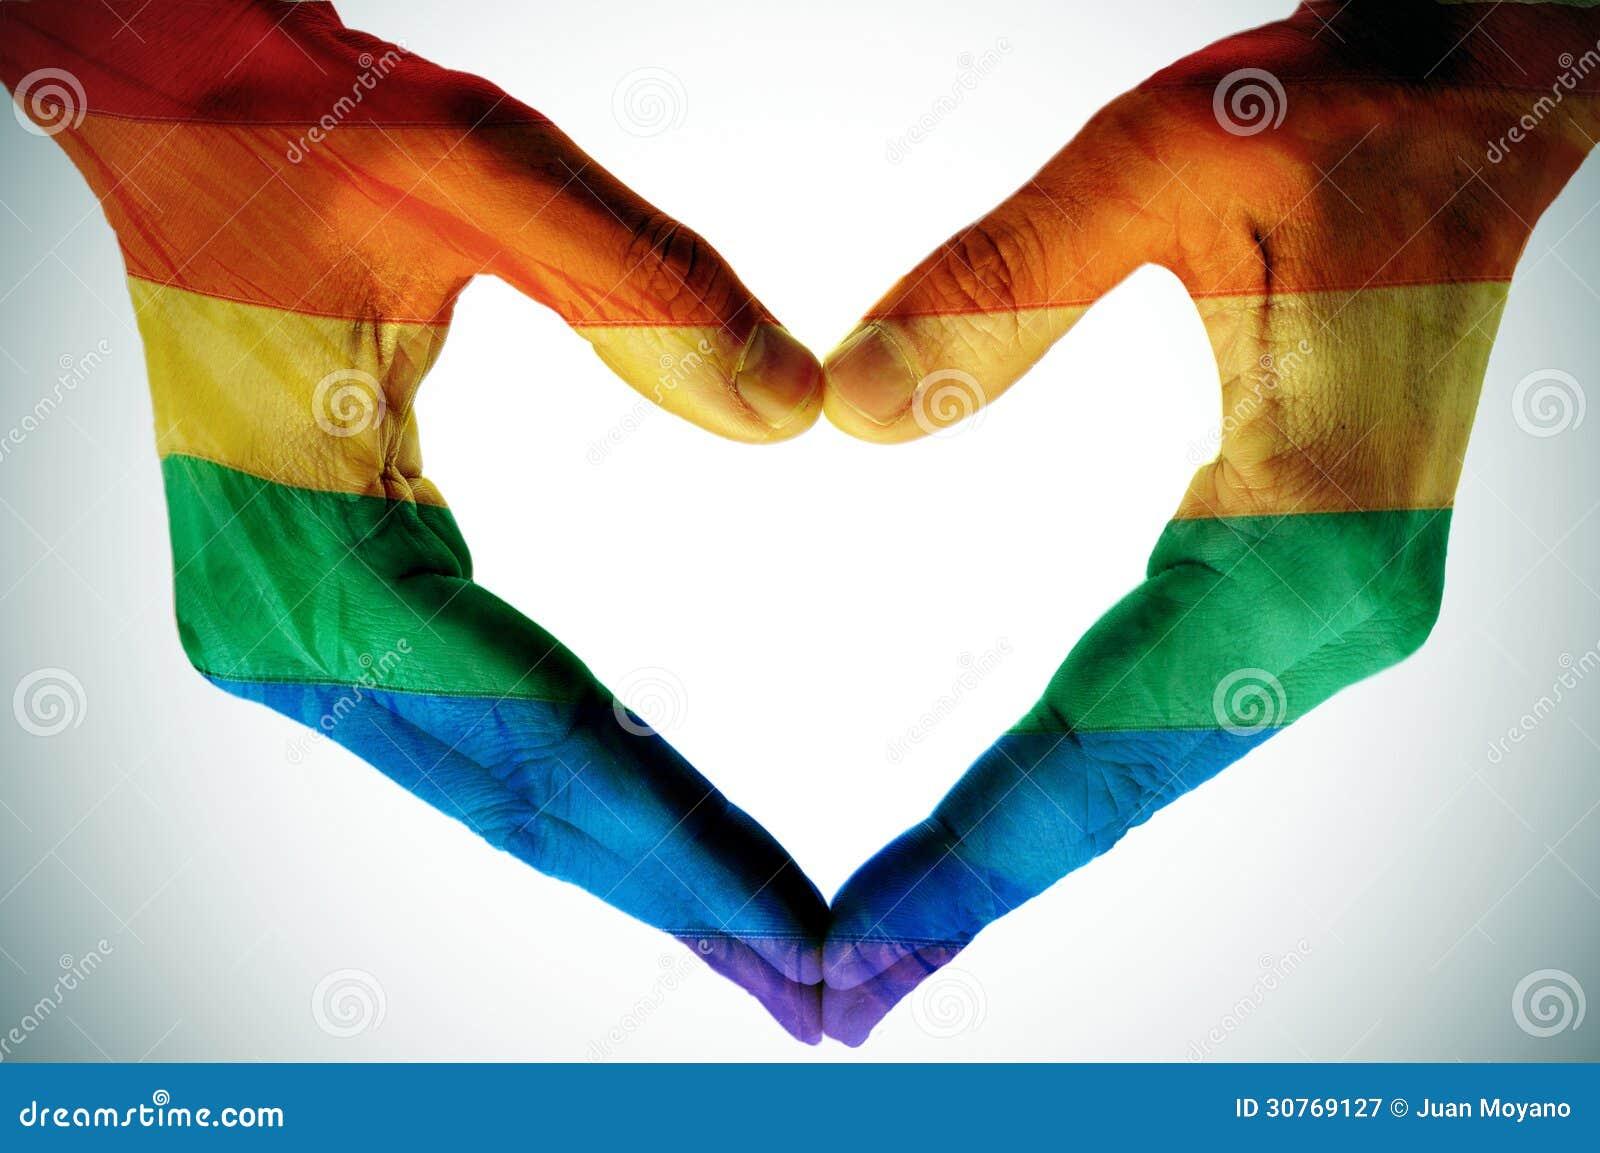 Homosexuell Twinks in Liebe vids